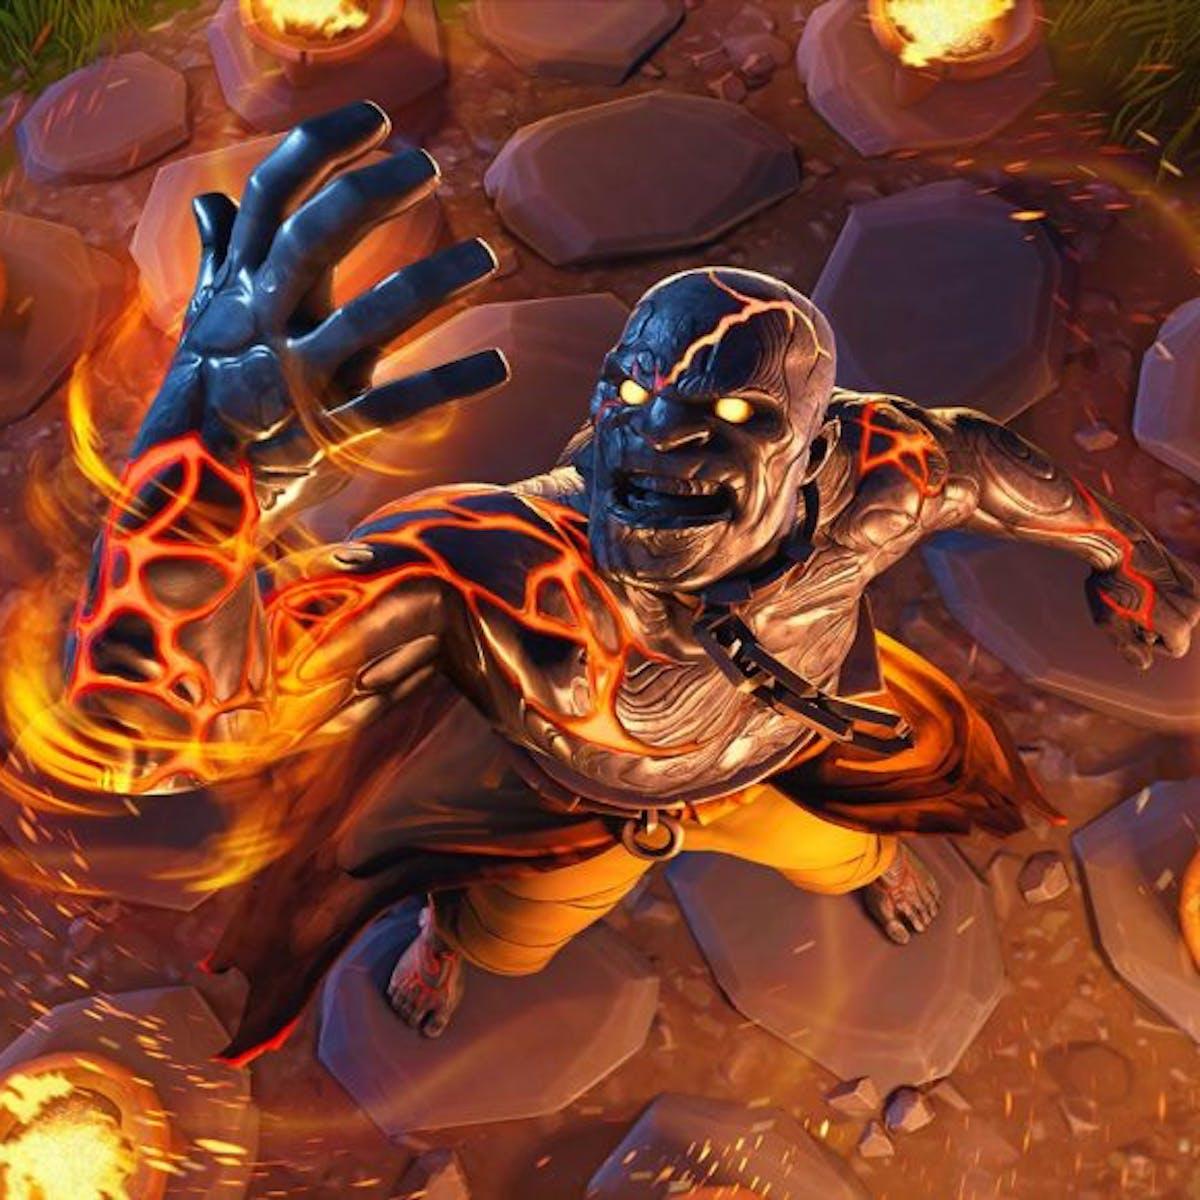 fortnite season 8 teaser 3 previews an explosive change for the island inverse - fortnite fire dragon glider